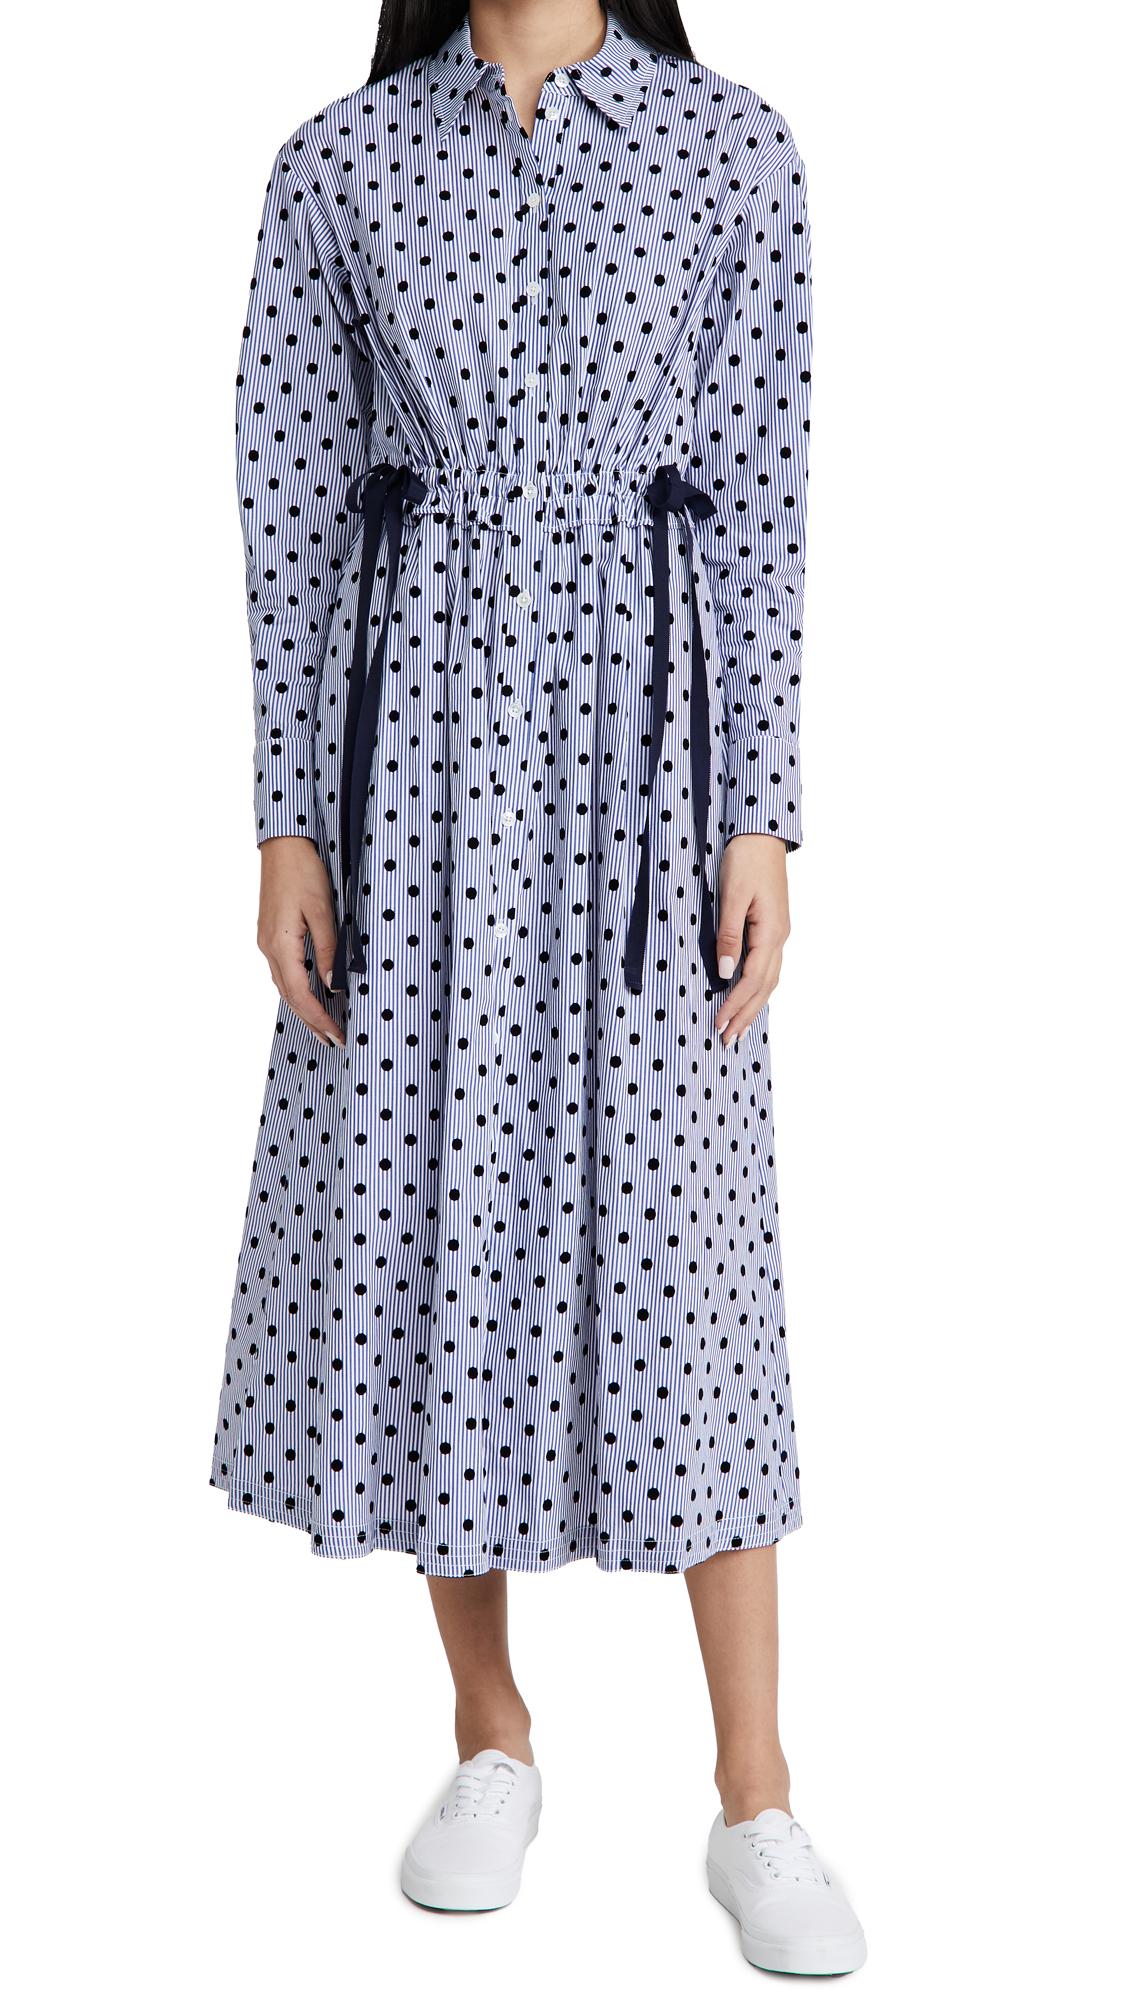 Jason Wu Polka Dot Shirt Dress